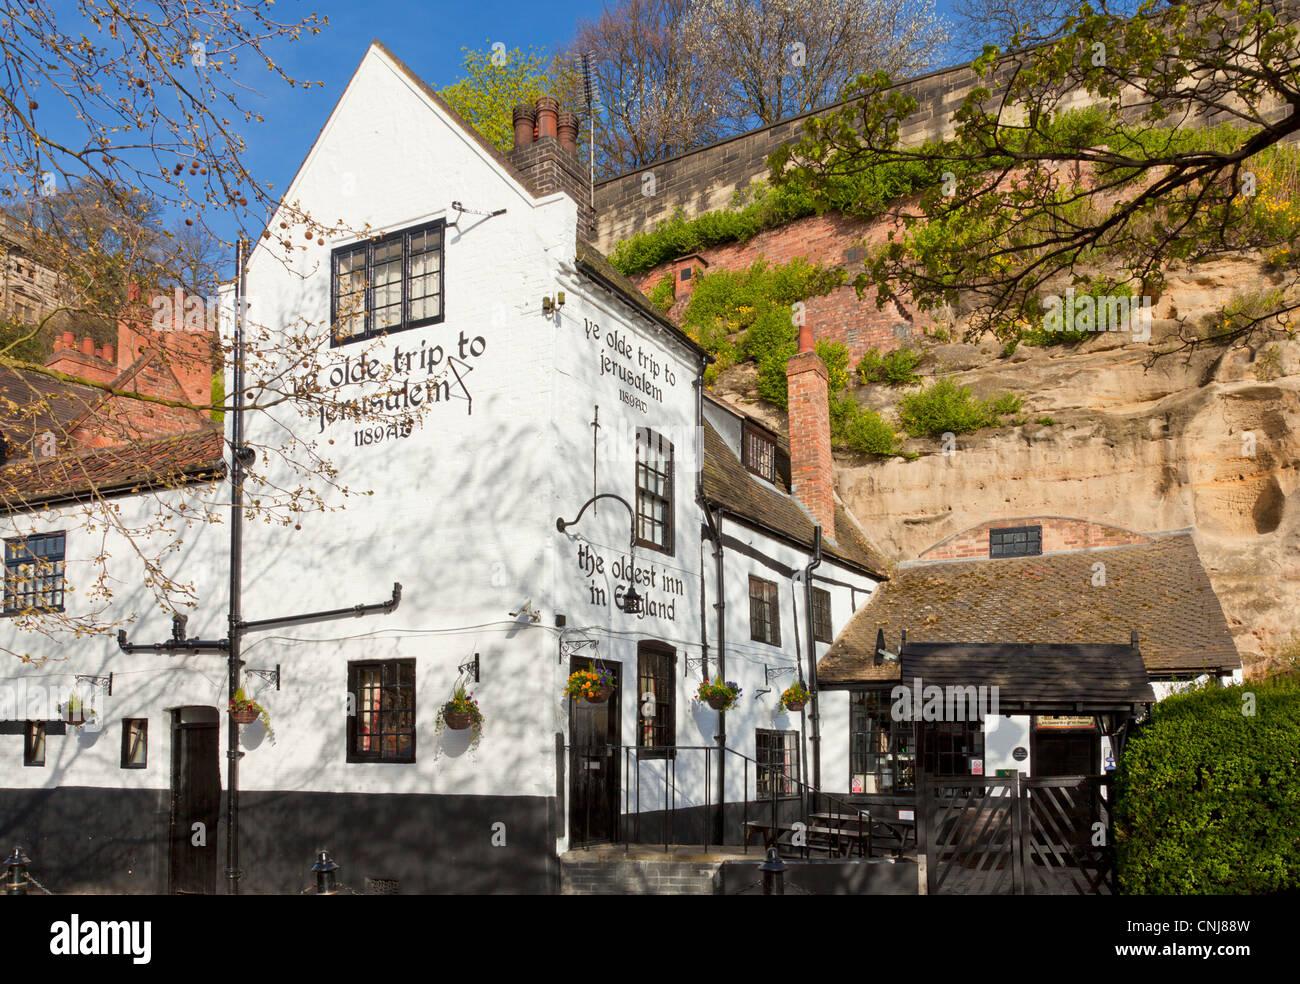 [Ye Olde viaje a Jerusalén] pub en el centro de la ciudad de Nottingham Inglaterra Nottinghamshire GB Europa Imagen De Stock